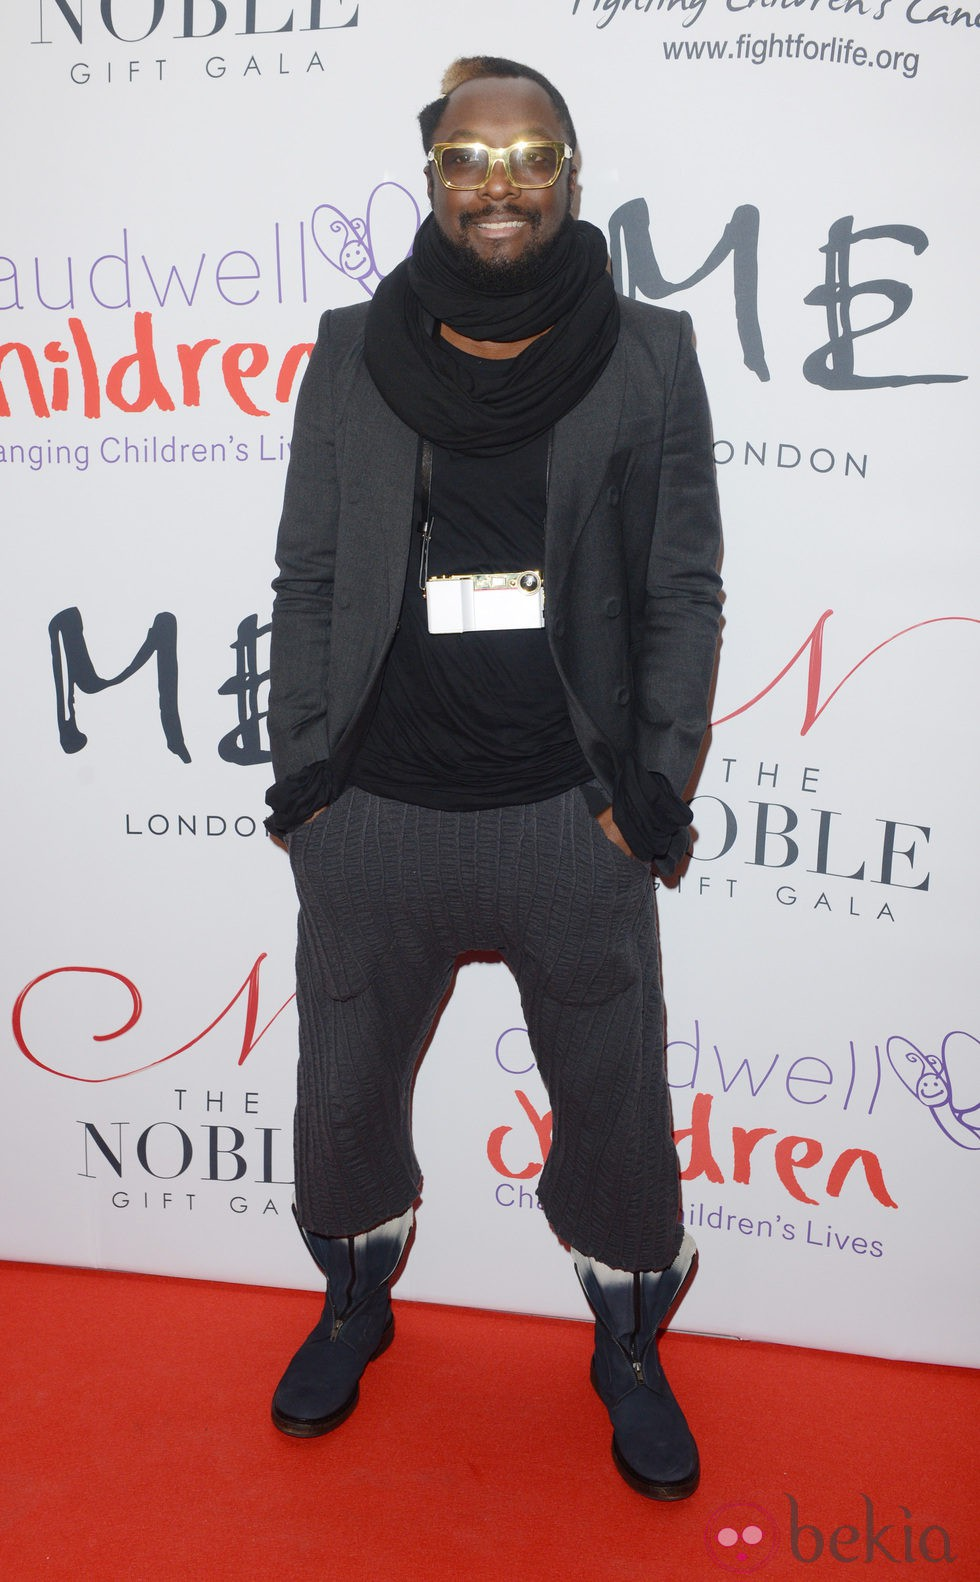 Will.i.am en la Noble Gift Gala 2012 celebrada en Londres